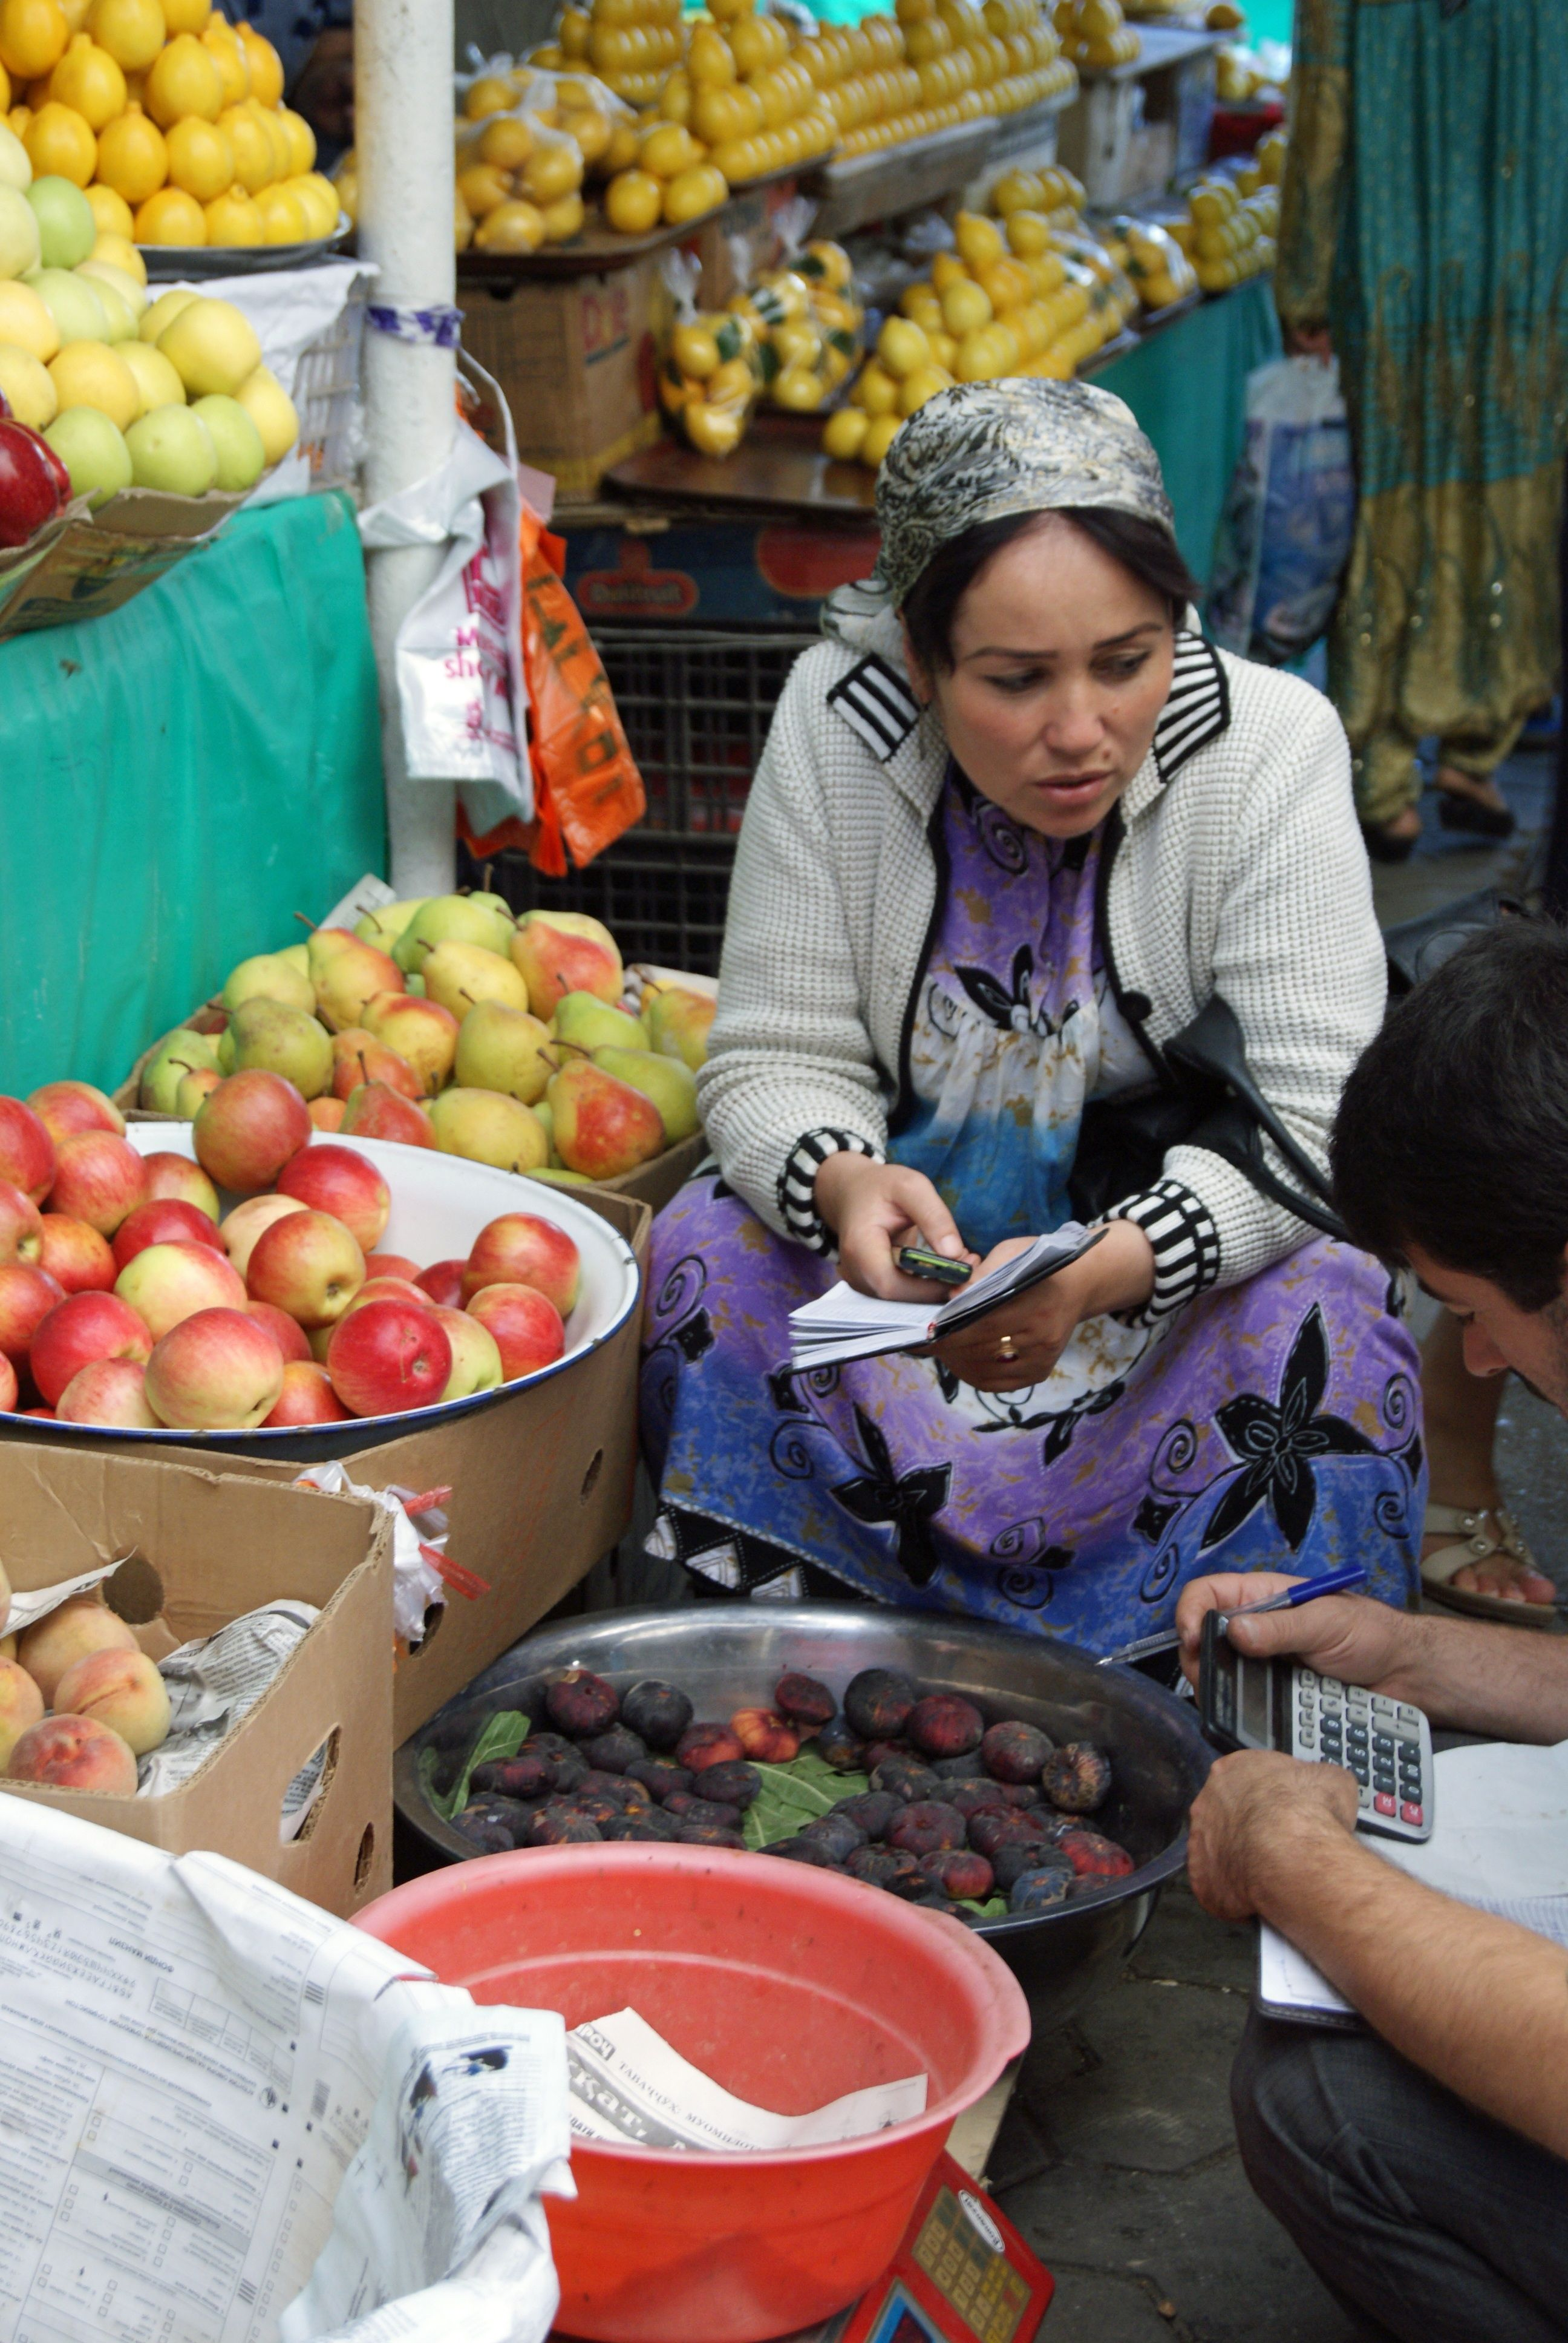 Melon Selling Boy, Mezar-i Sherif, Sare Pol, Afghanistan